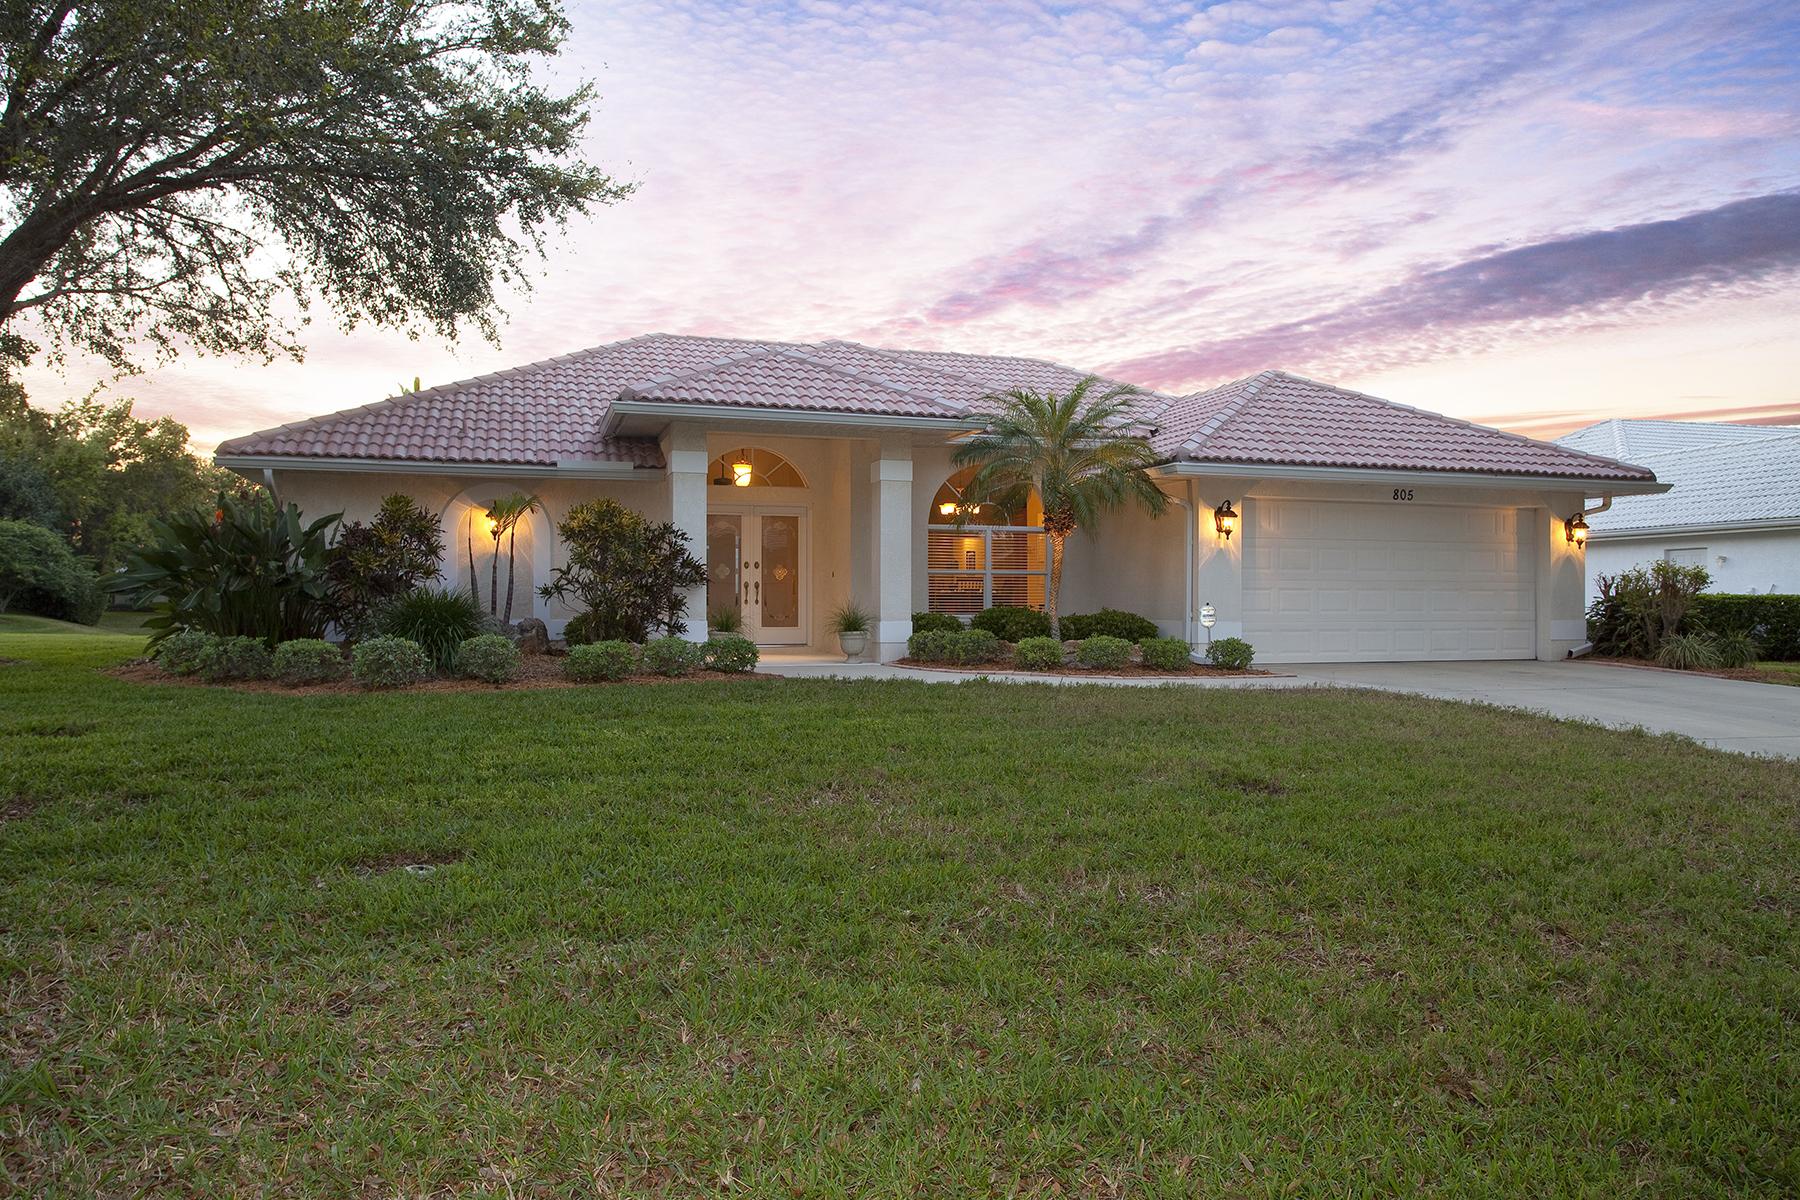 sales property at 805 Connemara Cir , Venice, FL 34292